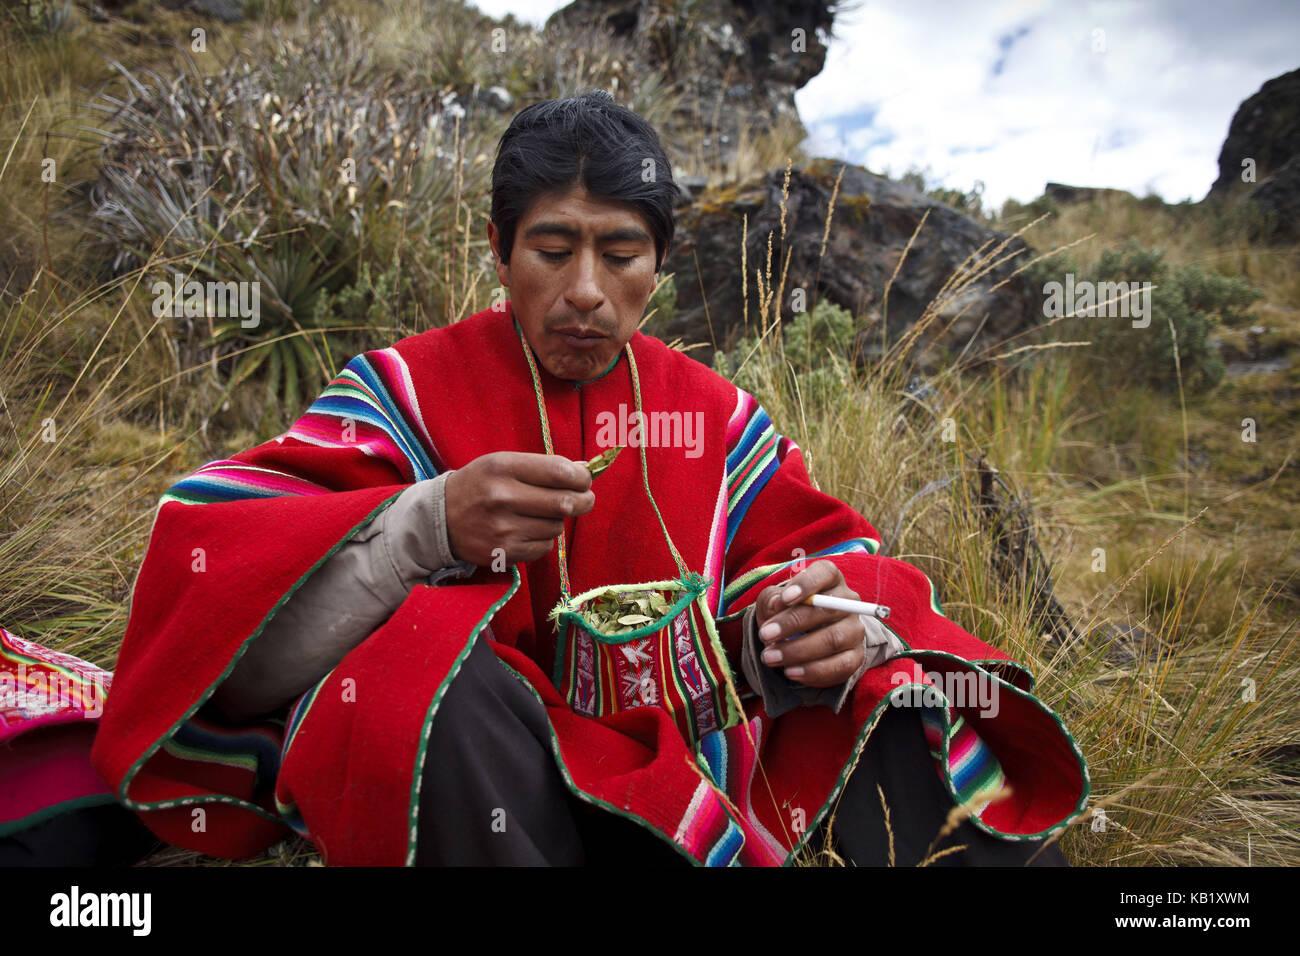 Bolivia, Cordillera Apolobamba, Kallawaya, ceremony, healer, traditional costume, - Stock Image